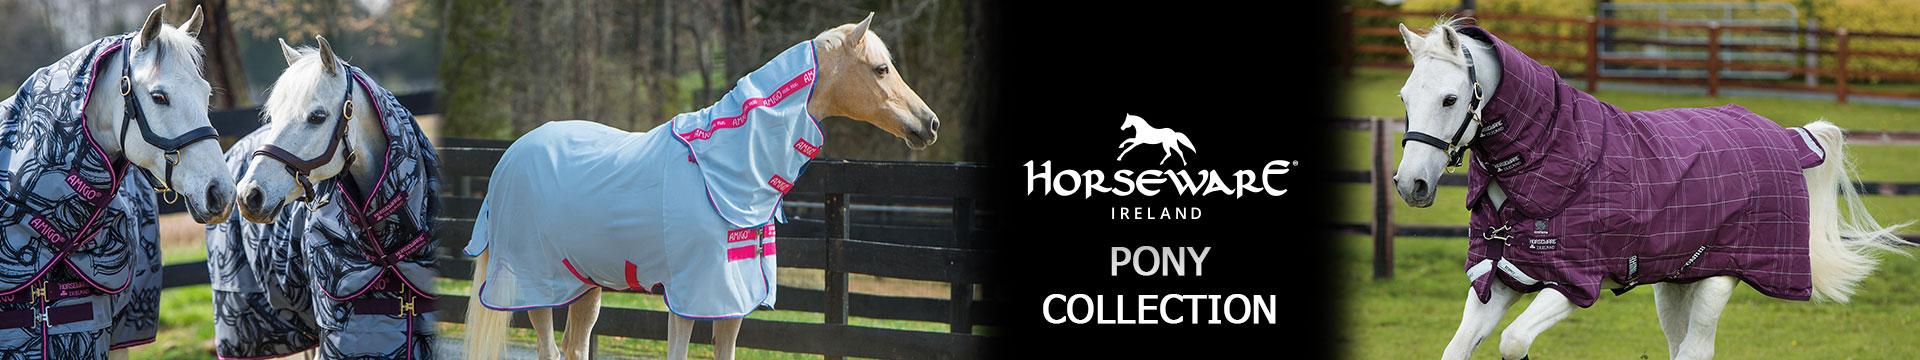 Horseware Pony Collection